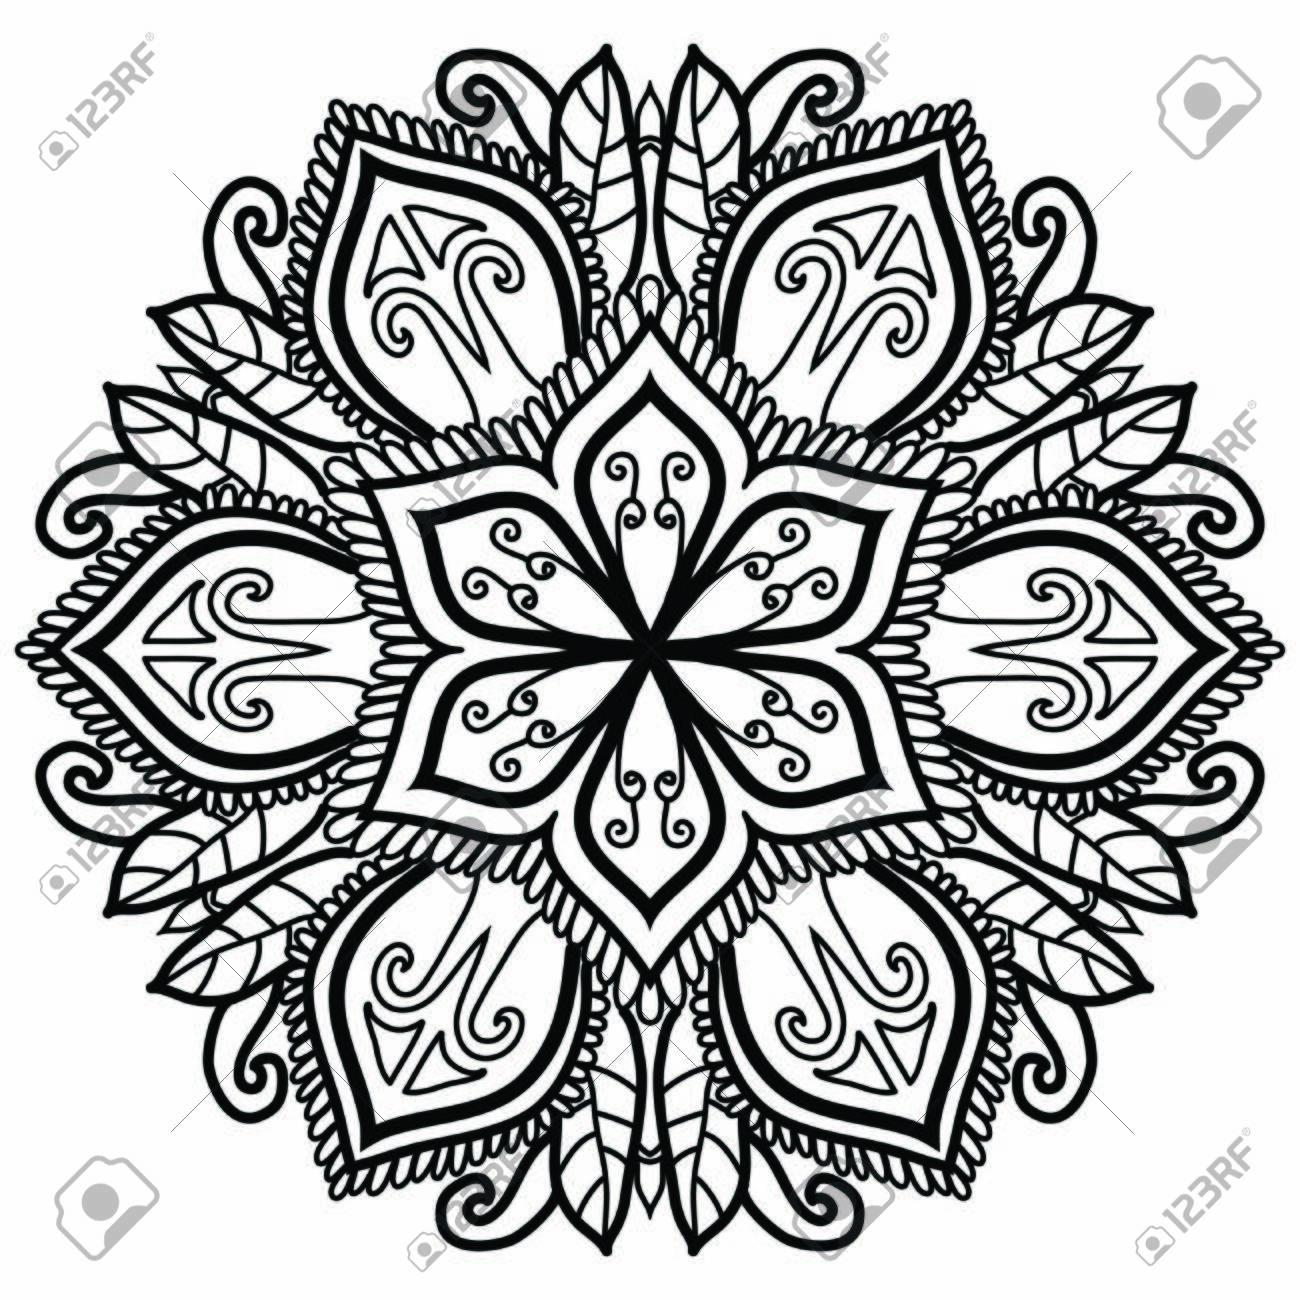 Mandala Vector Art Pattern Design - 143761231